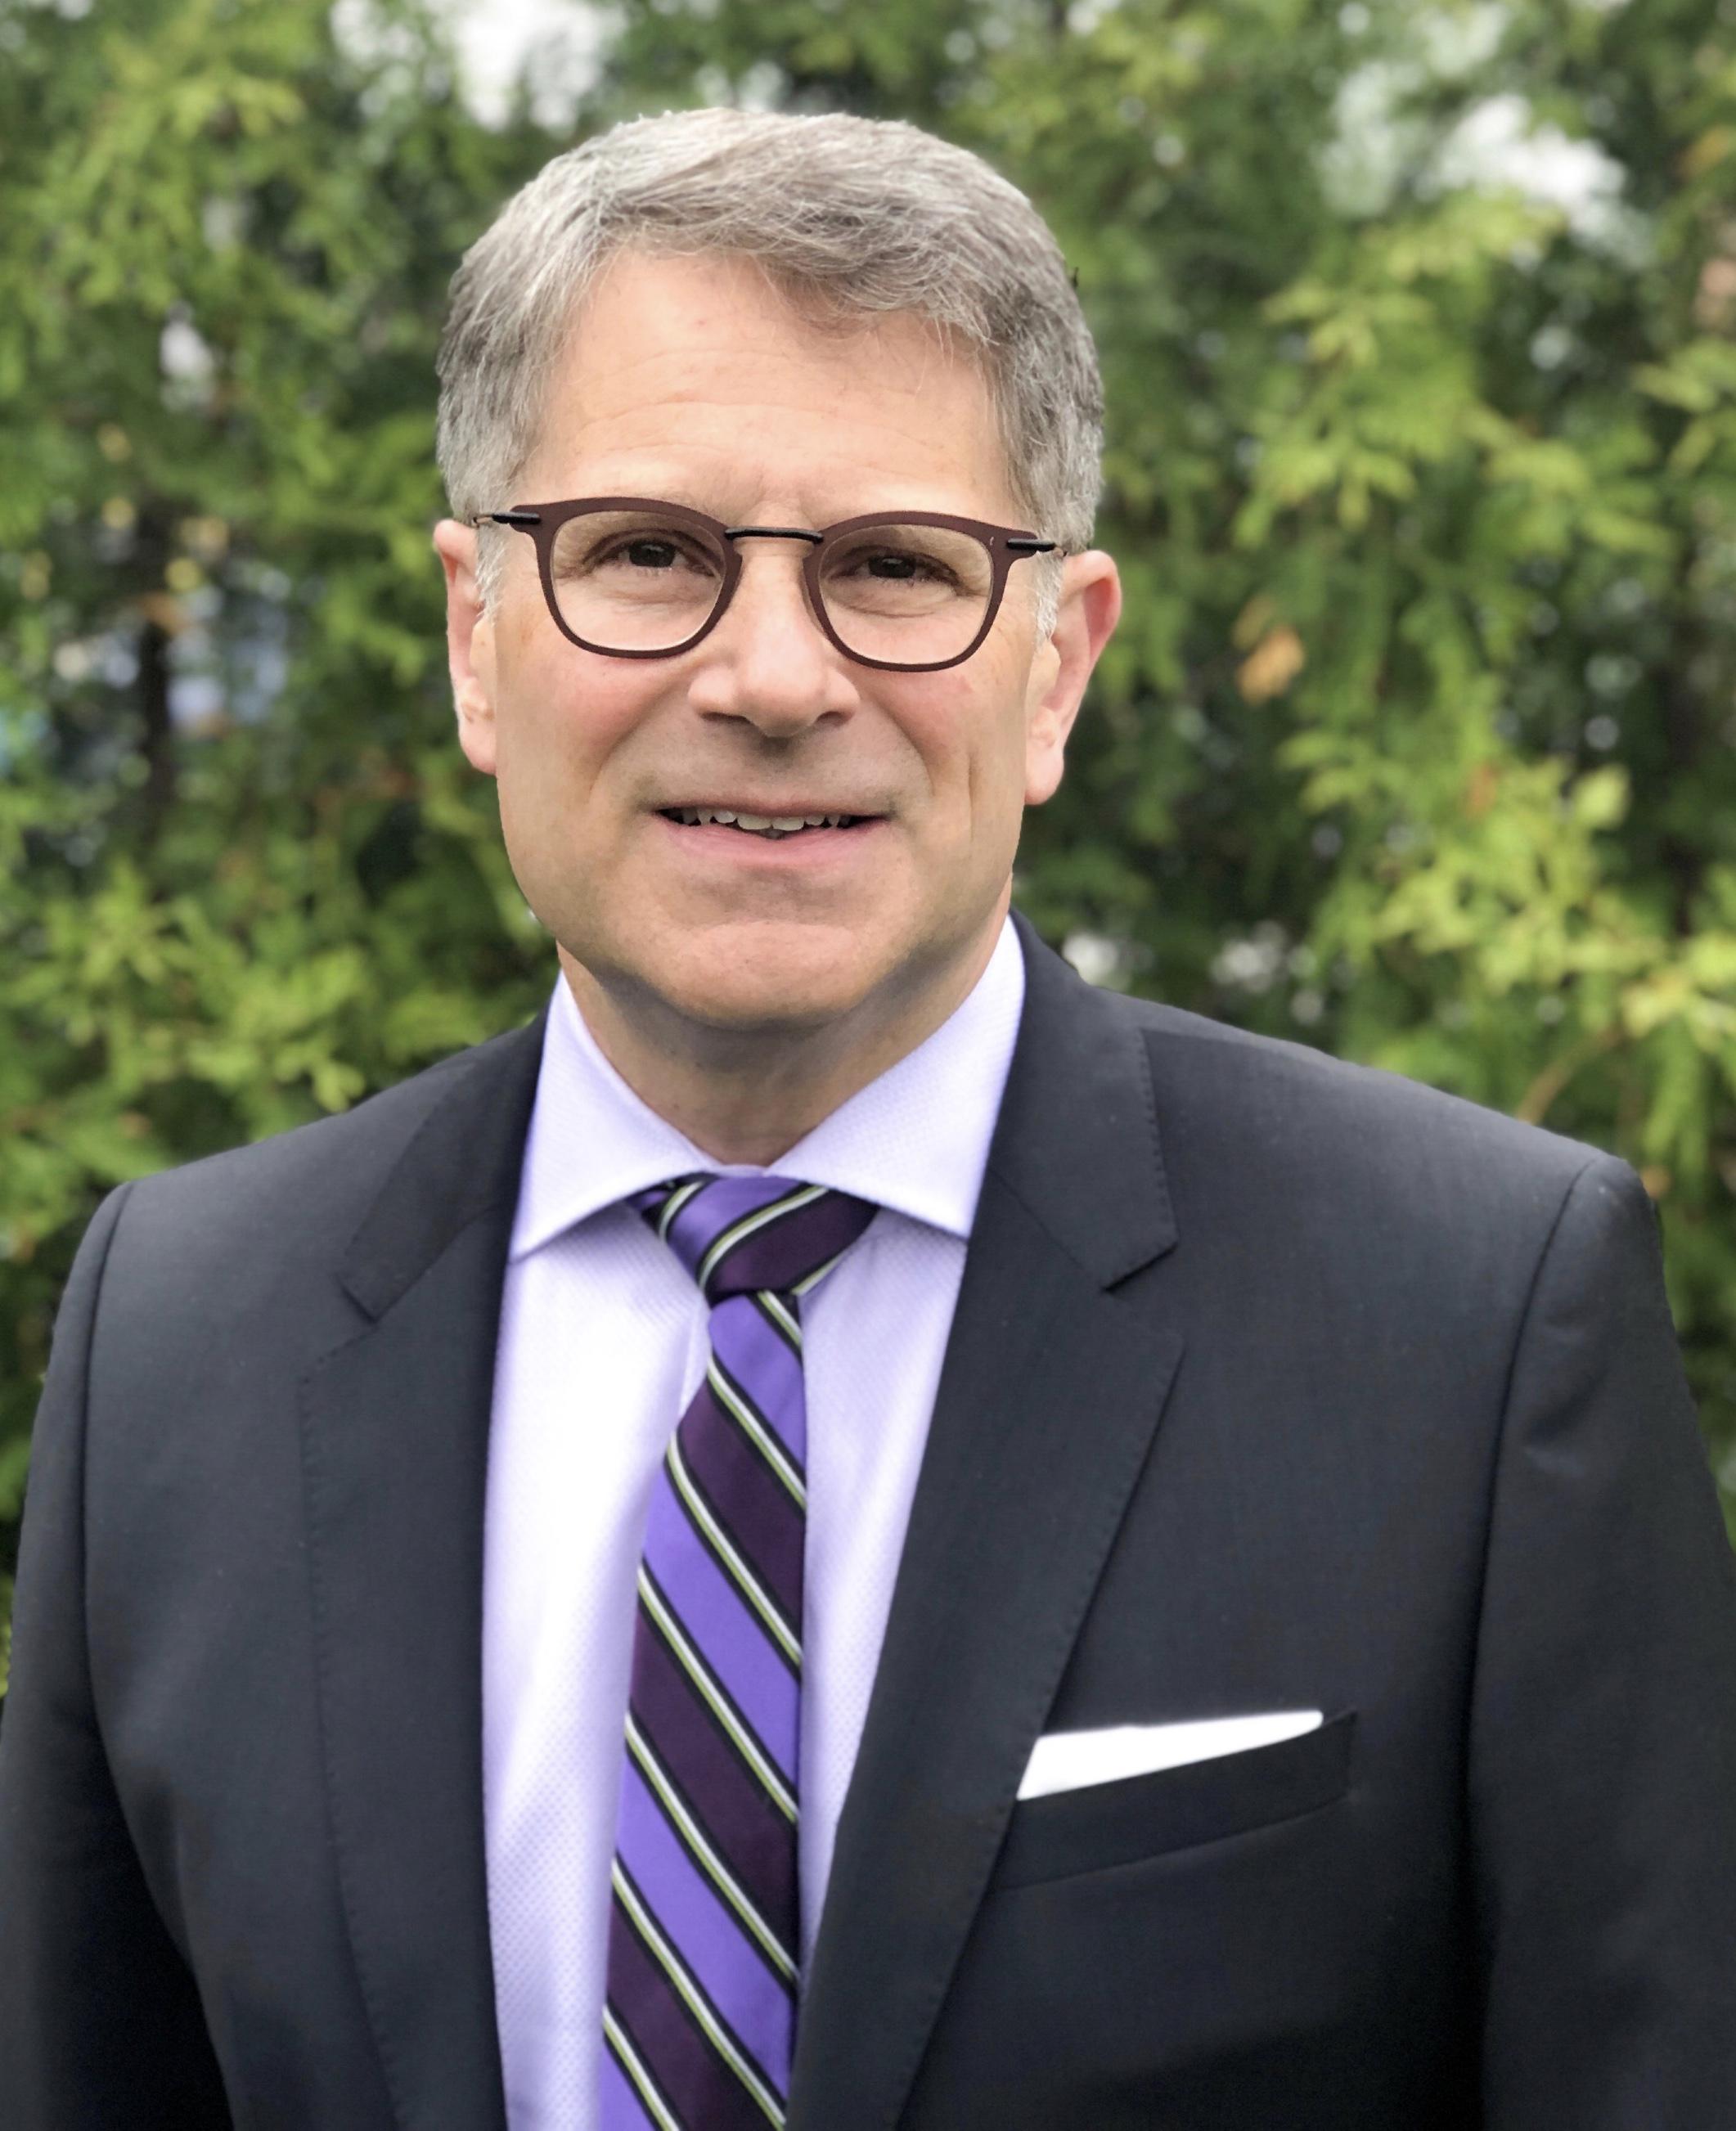 Image of Scott Kline, Interim President